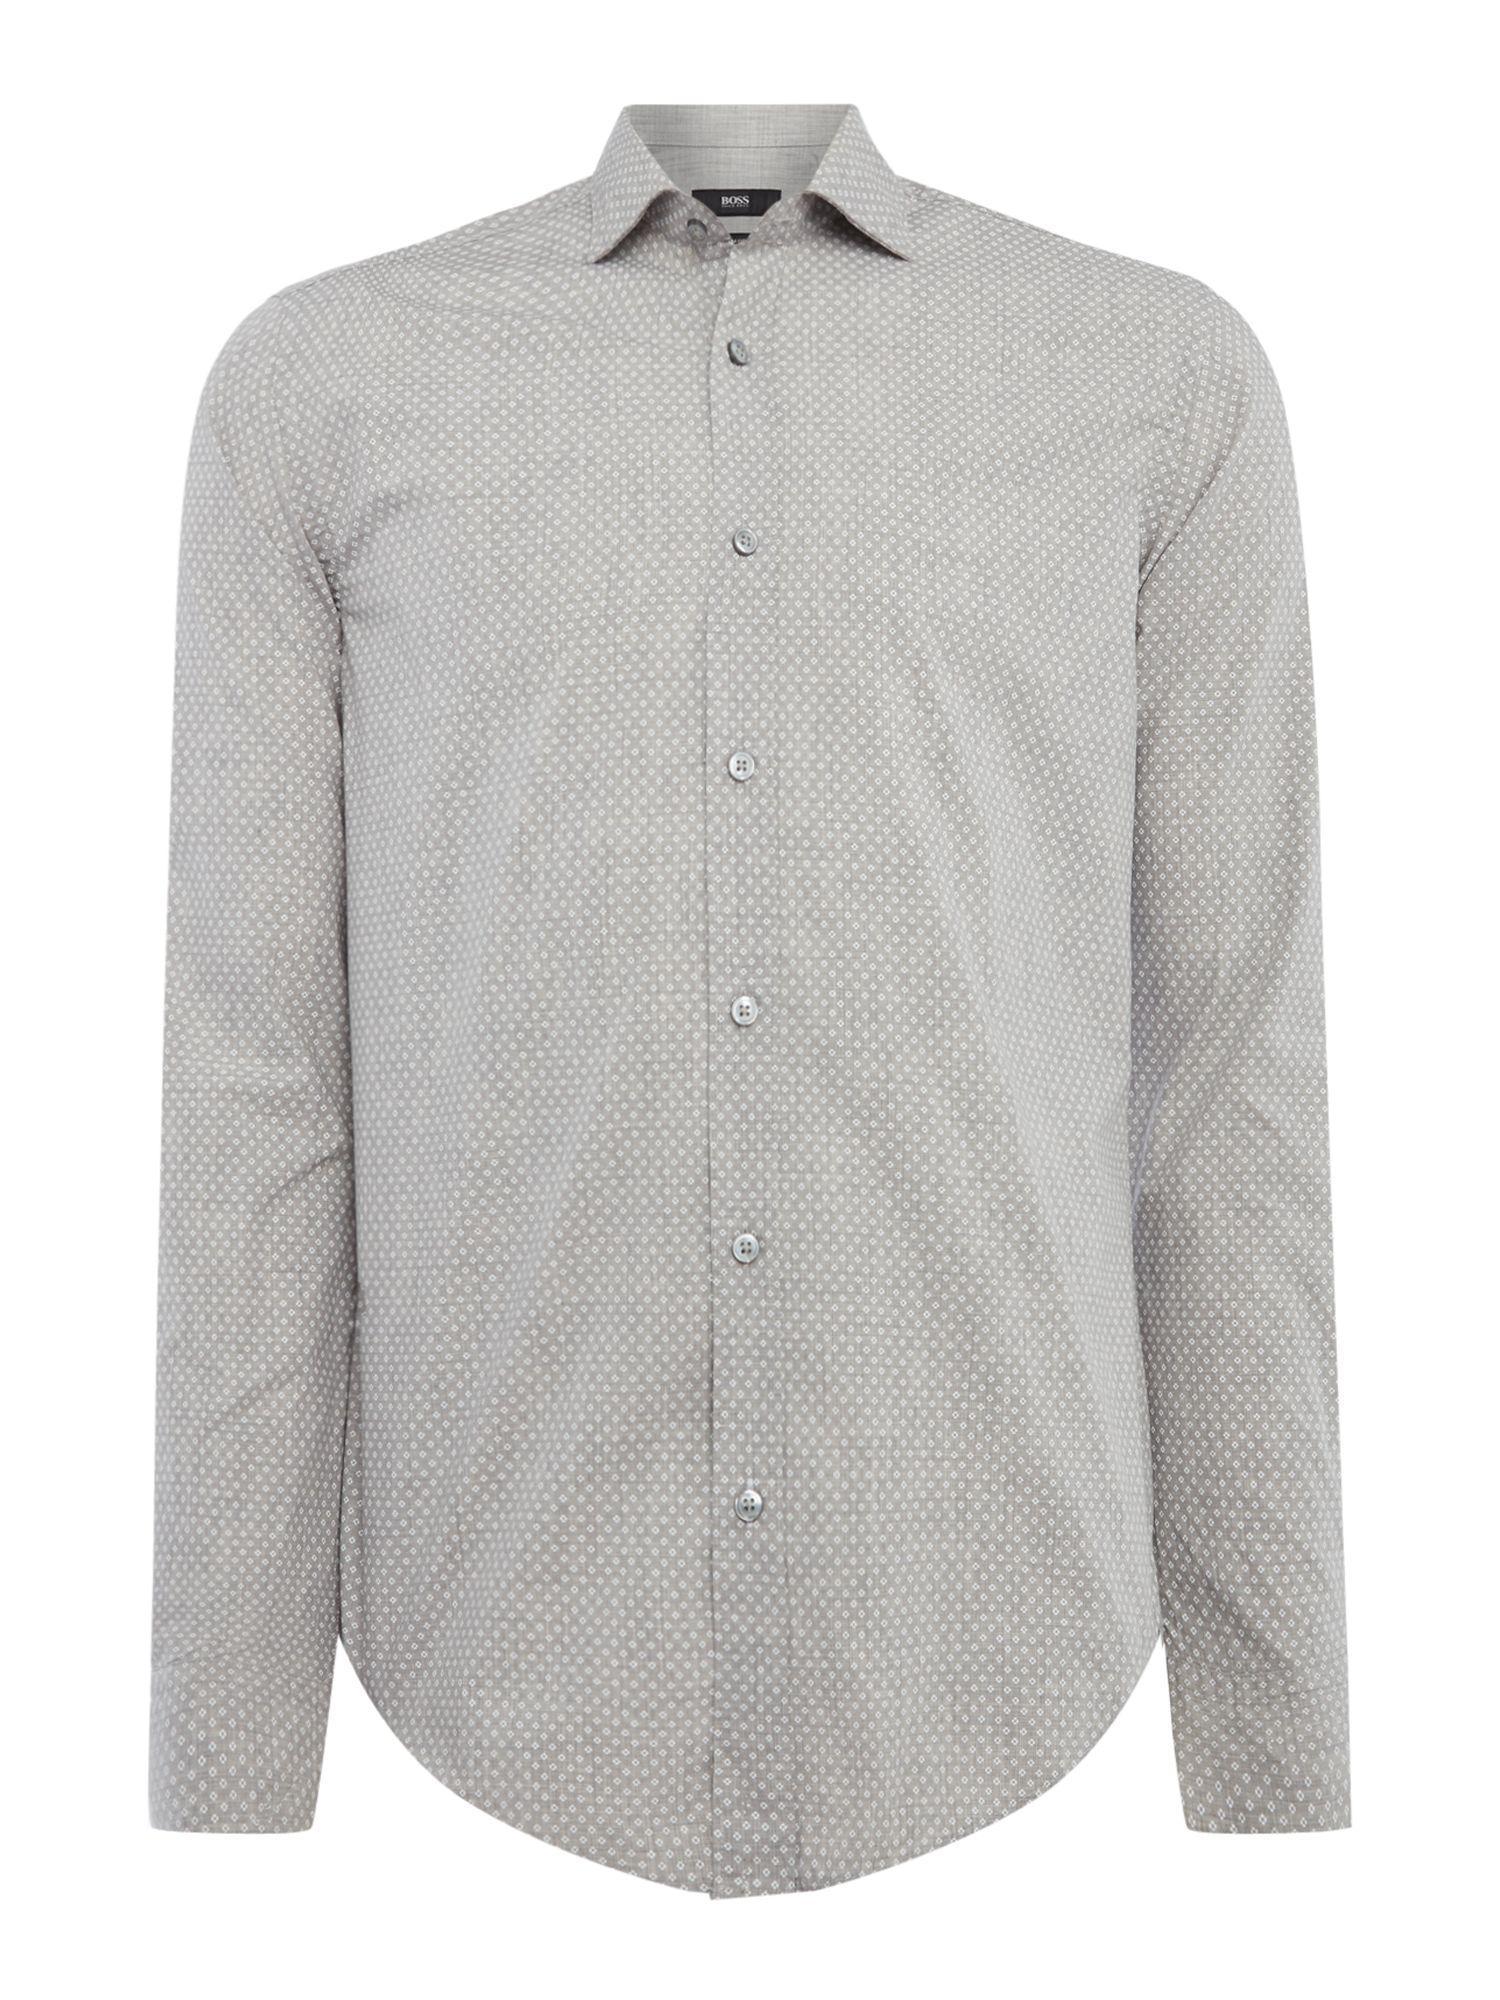 BOSS. Gray Men's Ridley 33 Geo Dots Slim Fit Shirt